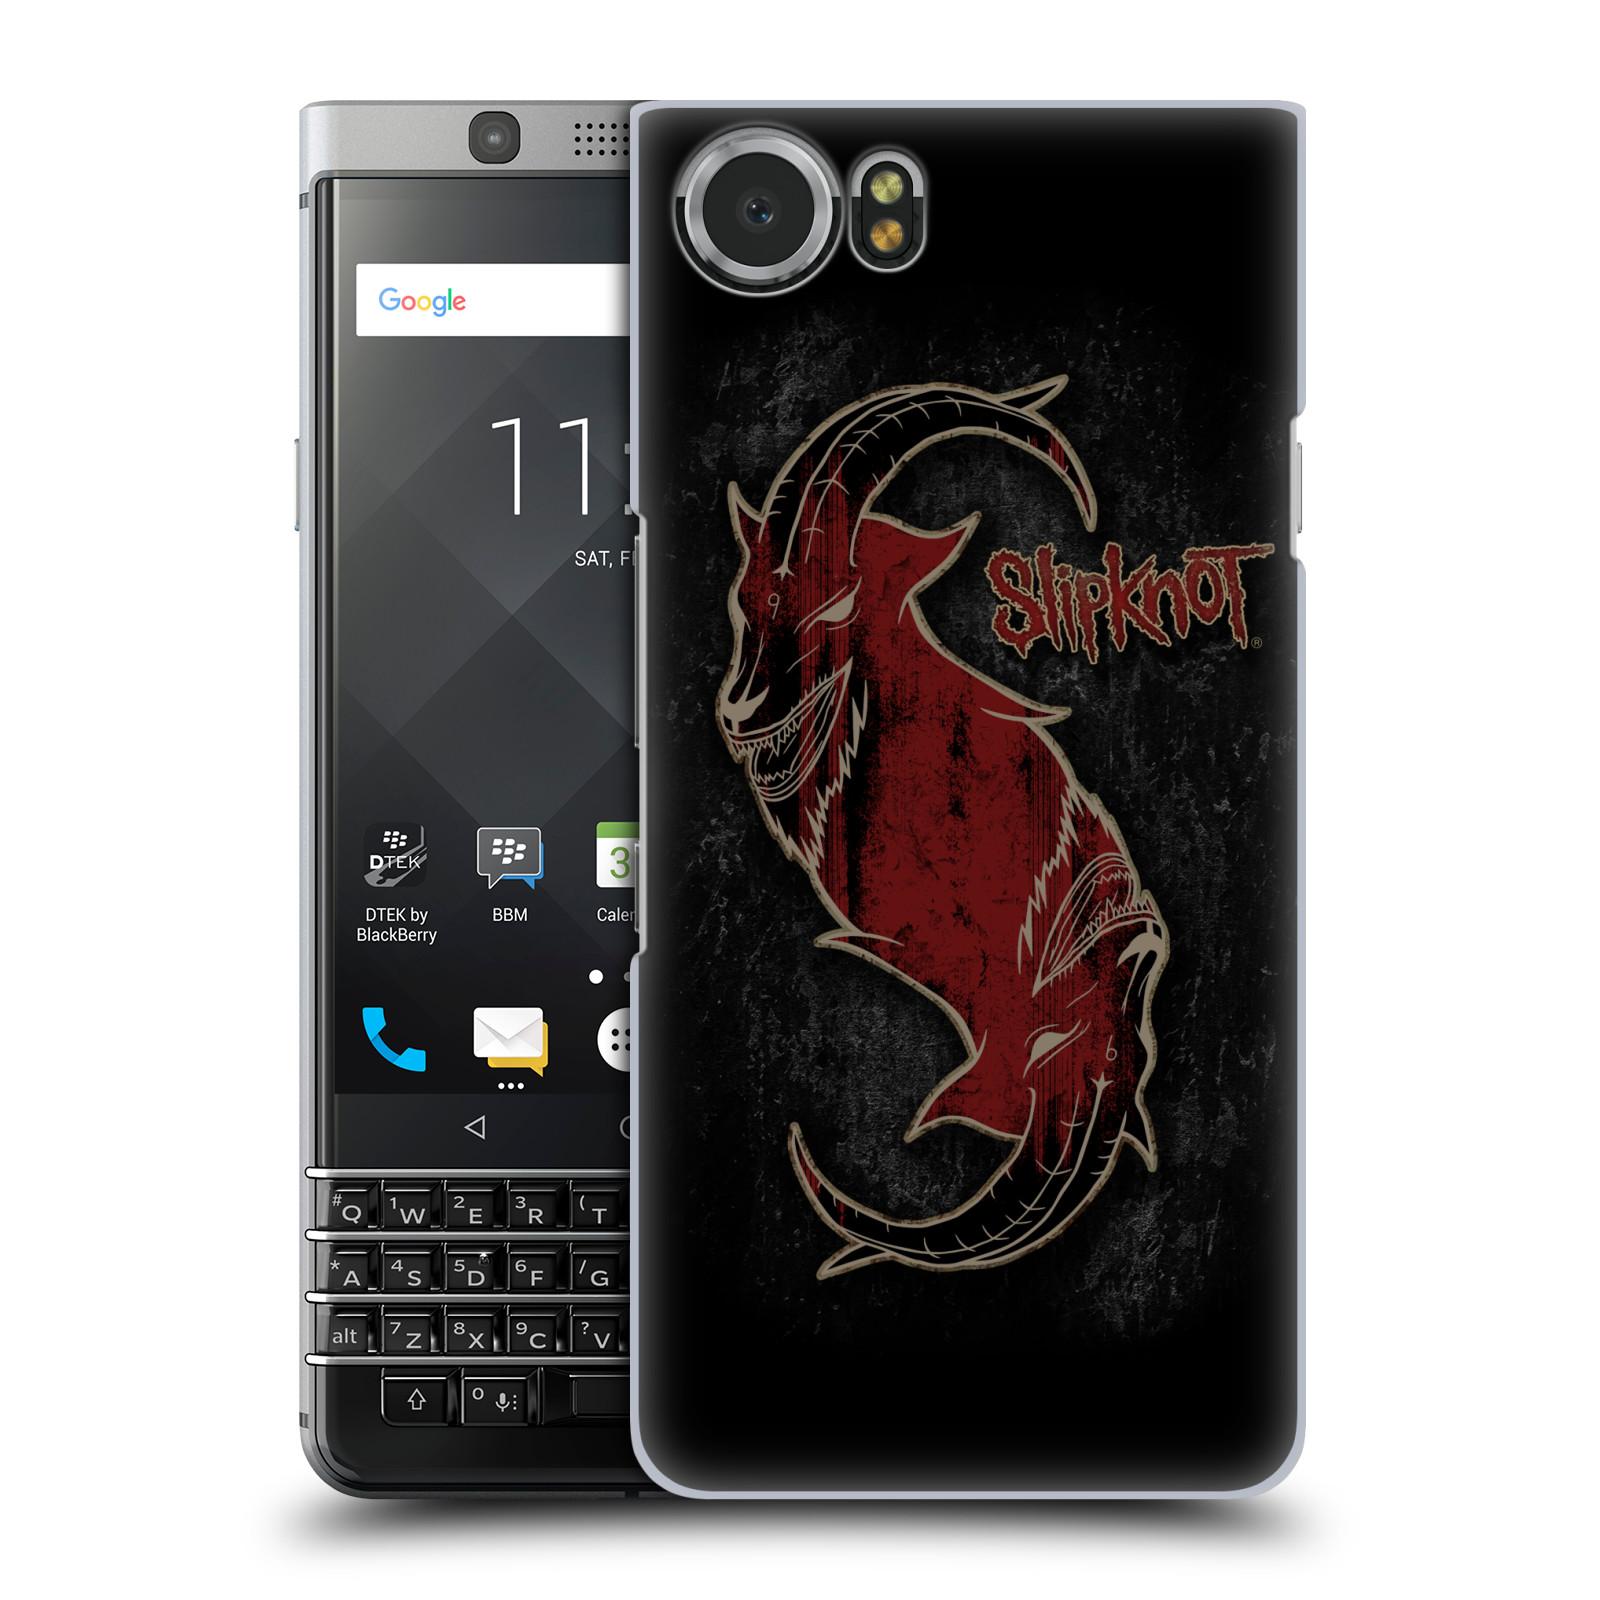 Plastové pouzdro na mobil BlackBerry KEYone - Head Case - Slipknot - Rudý kozel